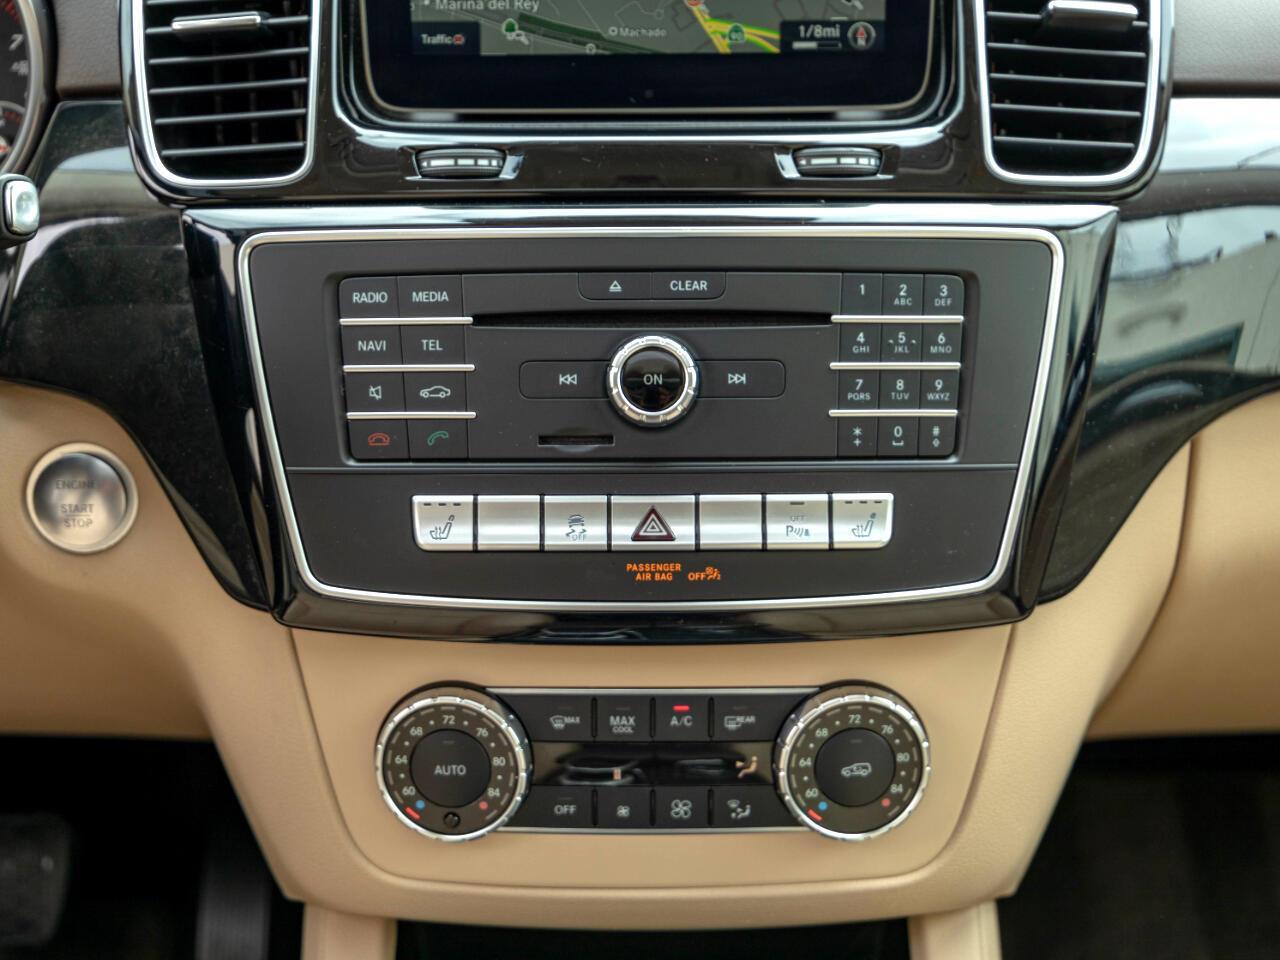 2017 Mercedes-Benz GL-Class (CC-1369120) for sale in Marina Del Rey, California